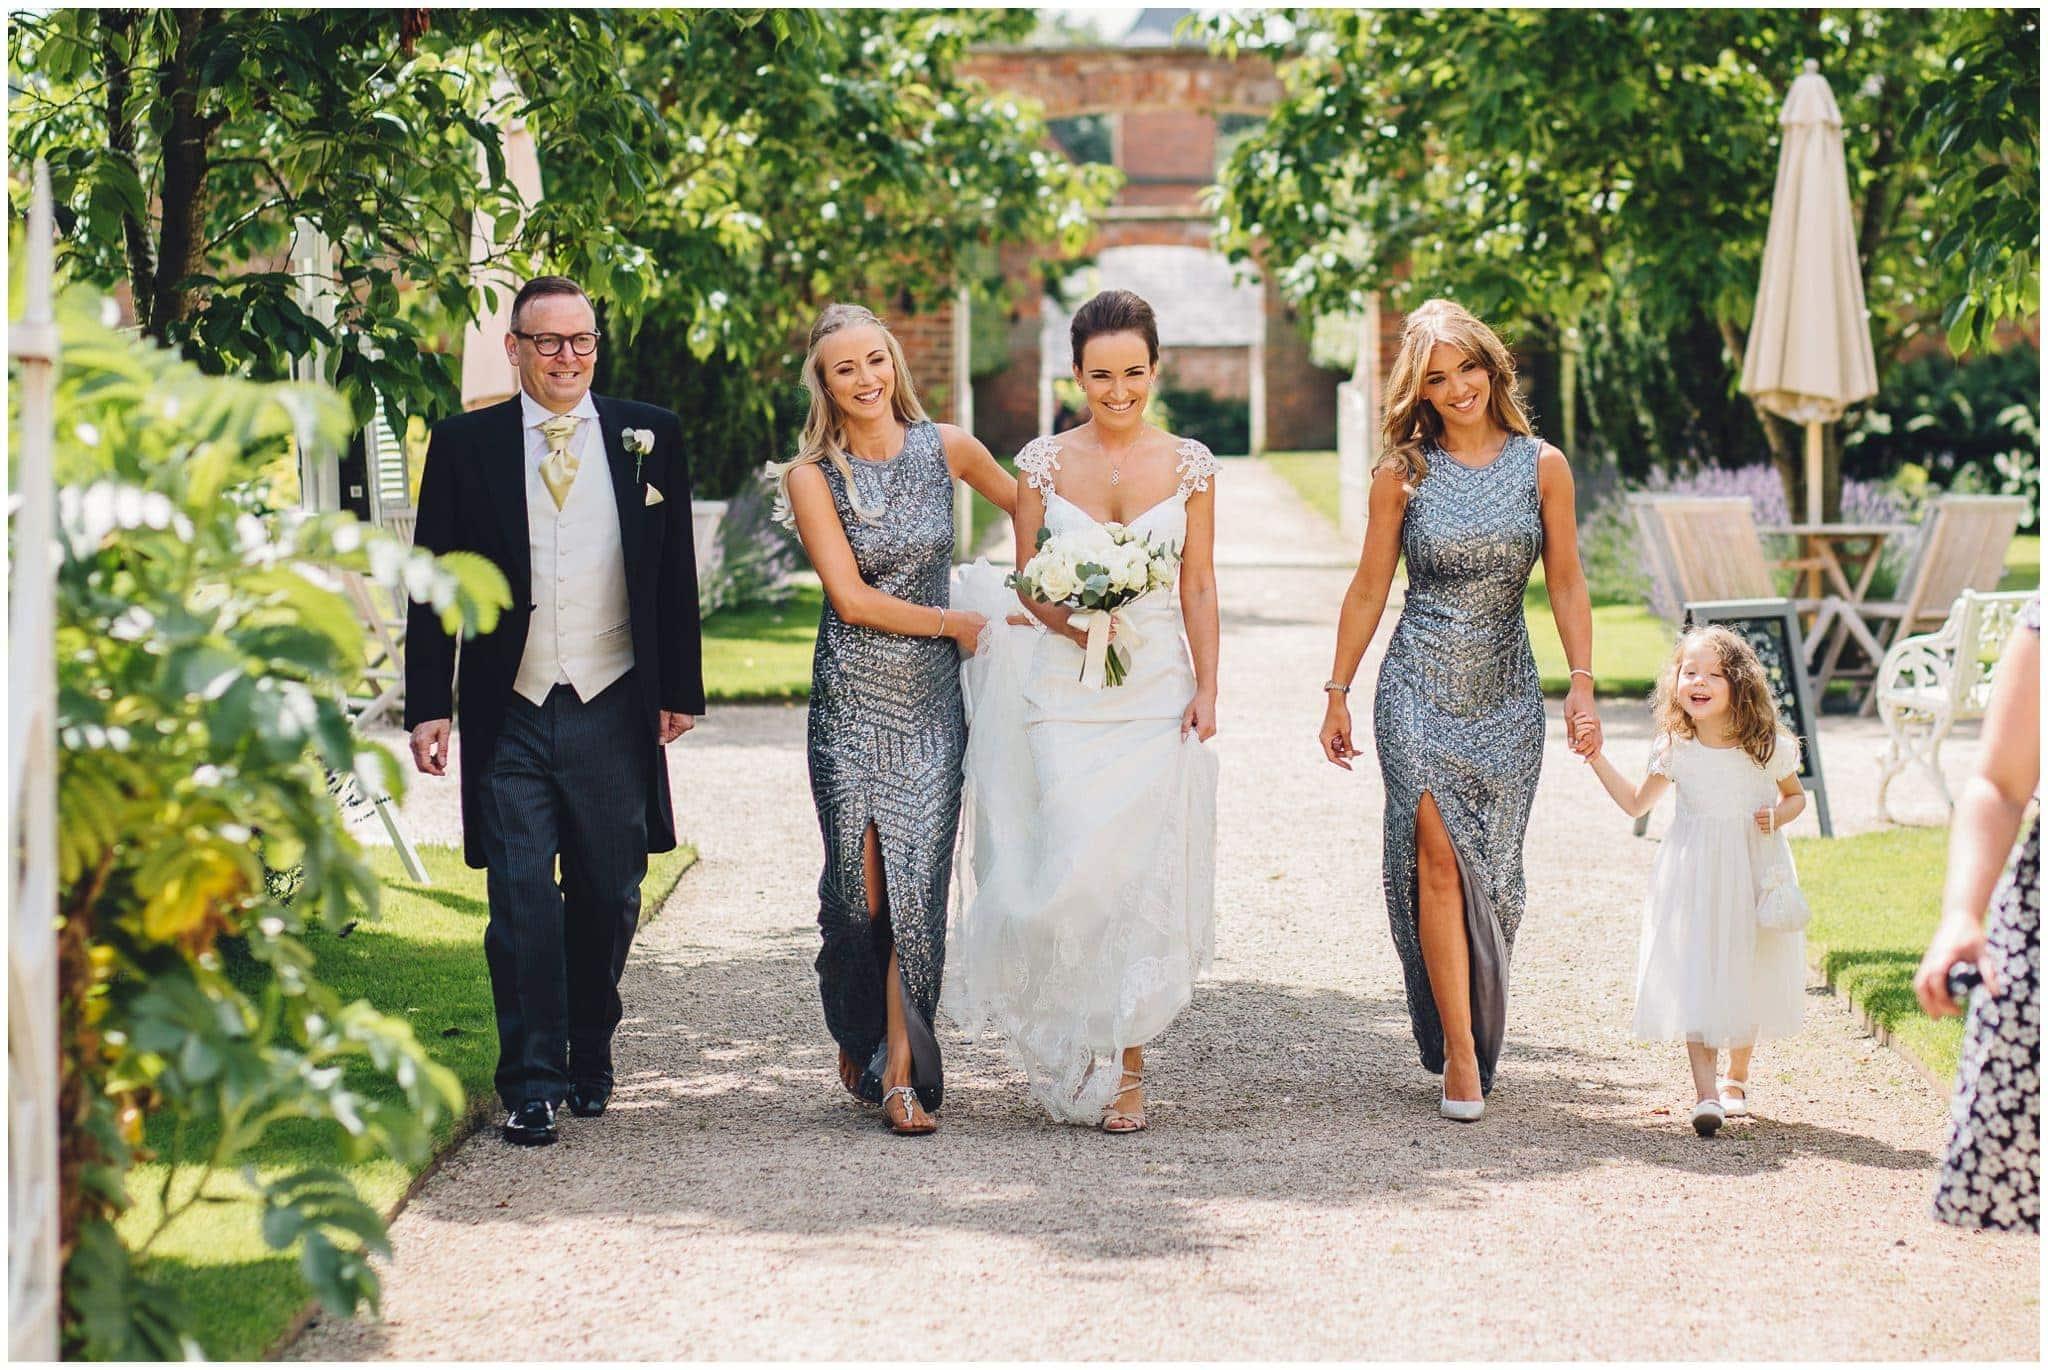 combermere-abbey-wedding-photographer-34